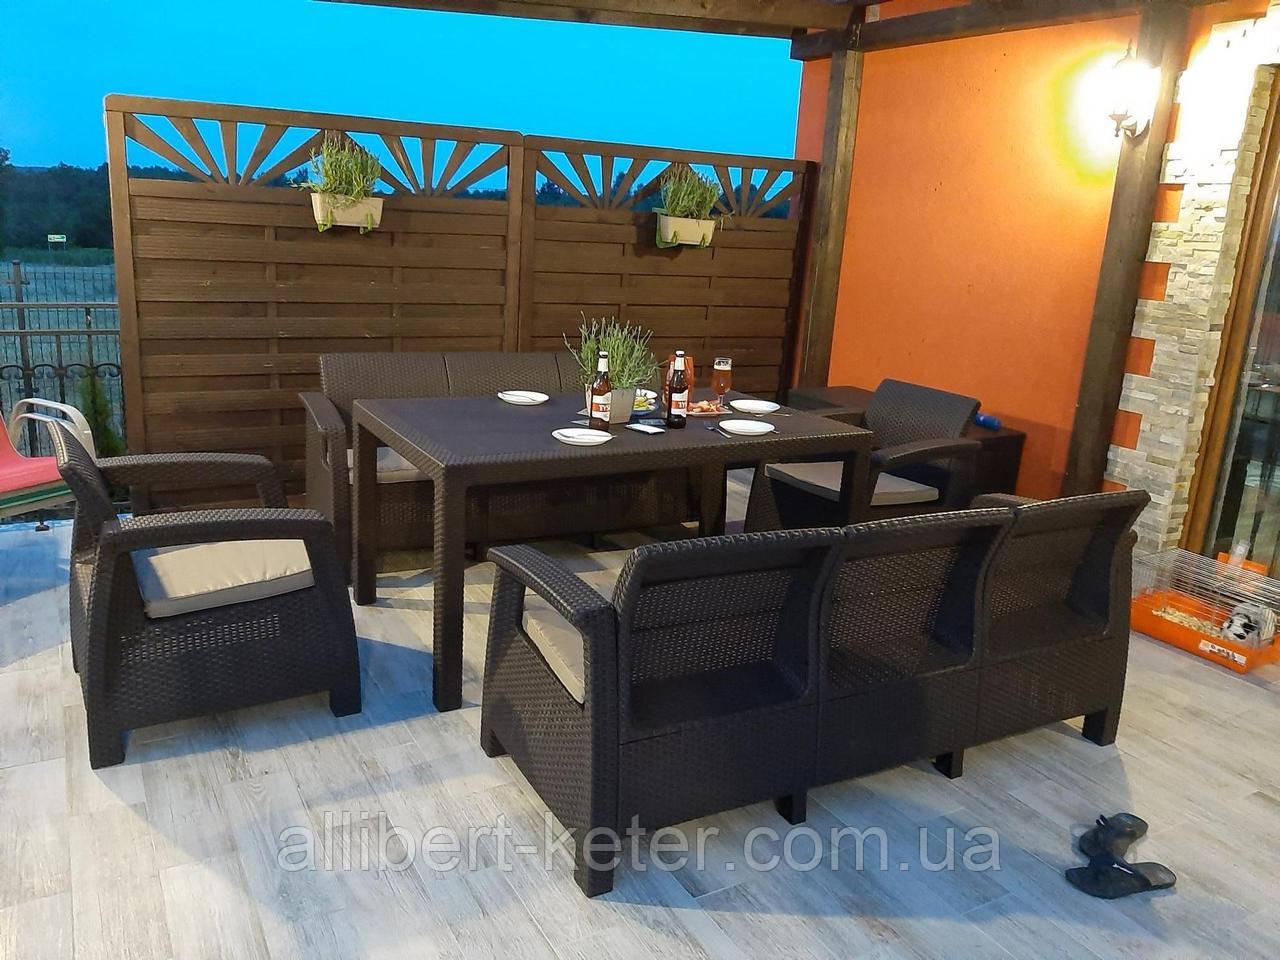 Комплект садових меблів Allibert by Keter Corfu Fiesta Max Dining Garden Set Brown ( коричневий )